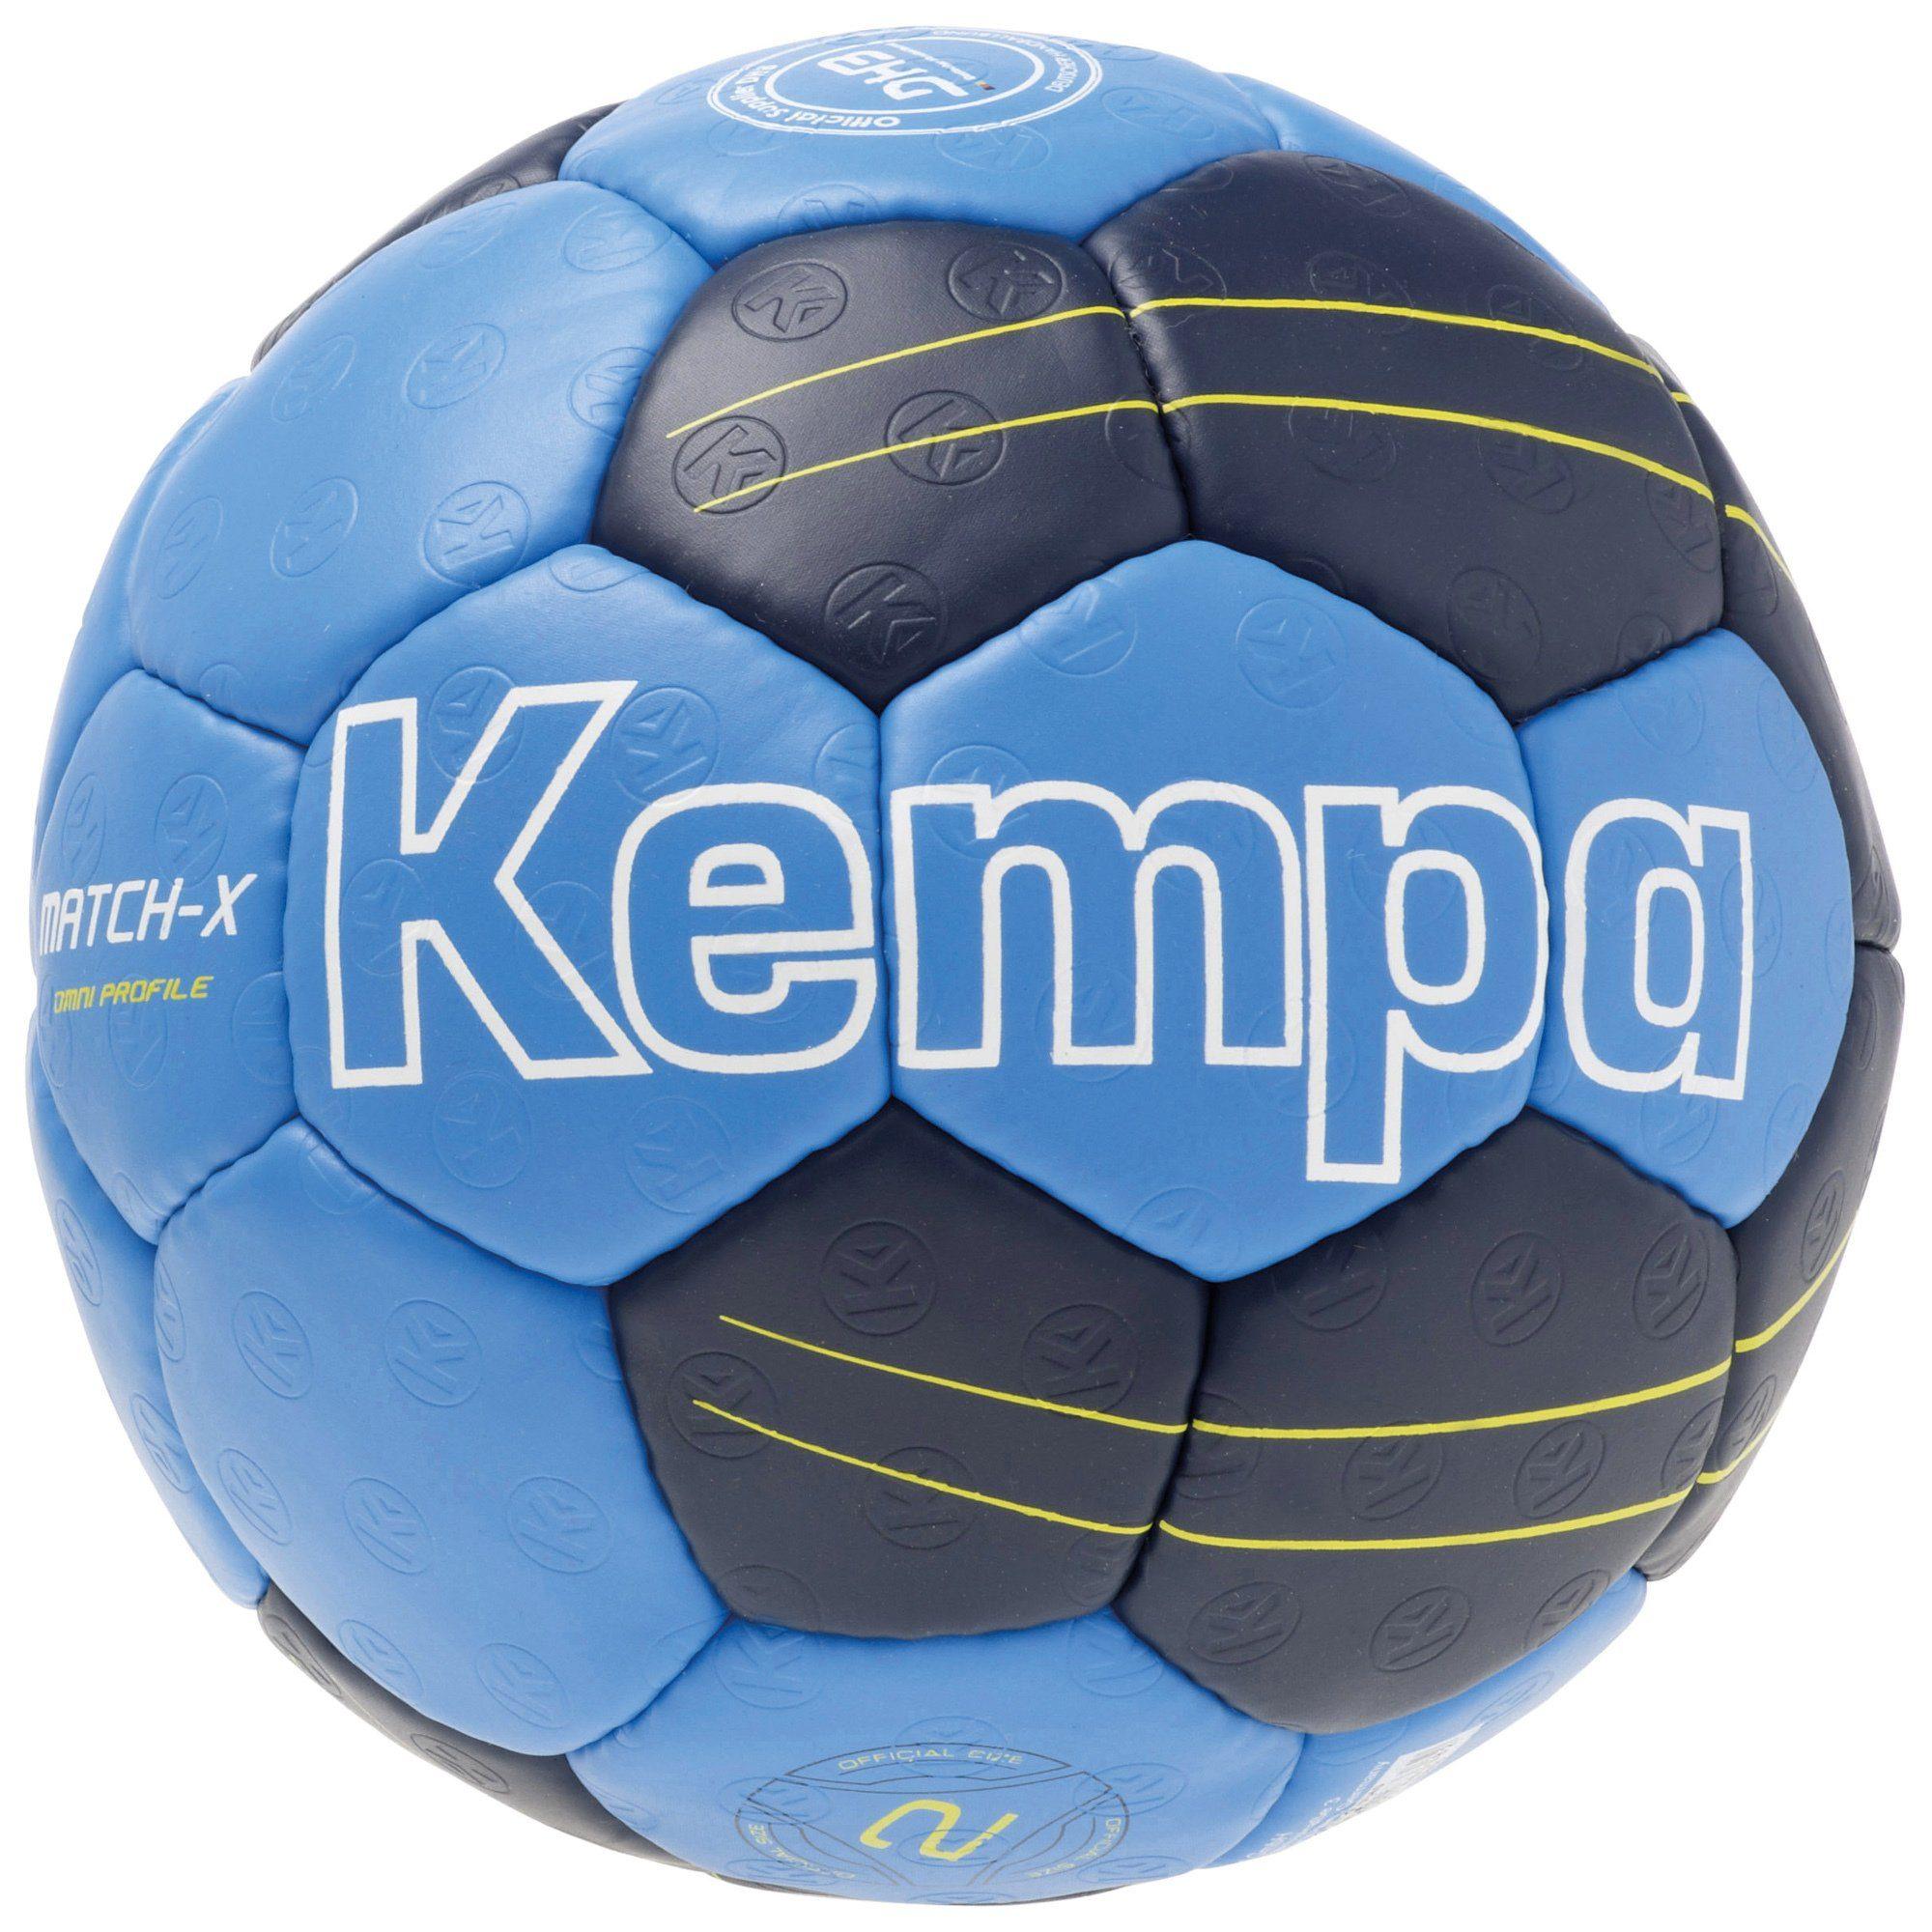 KEMPA Match-X Omni Profile Handball